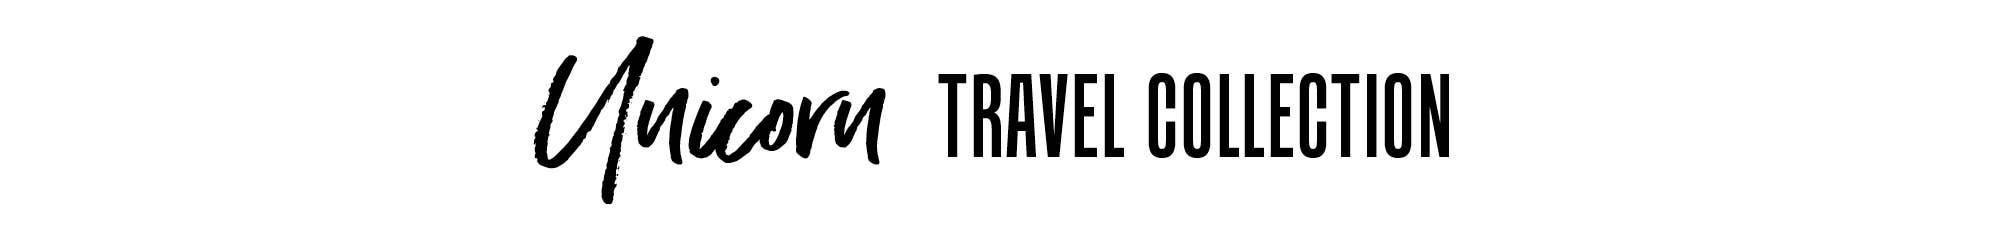 Unicorn Travel Collection